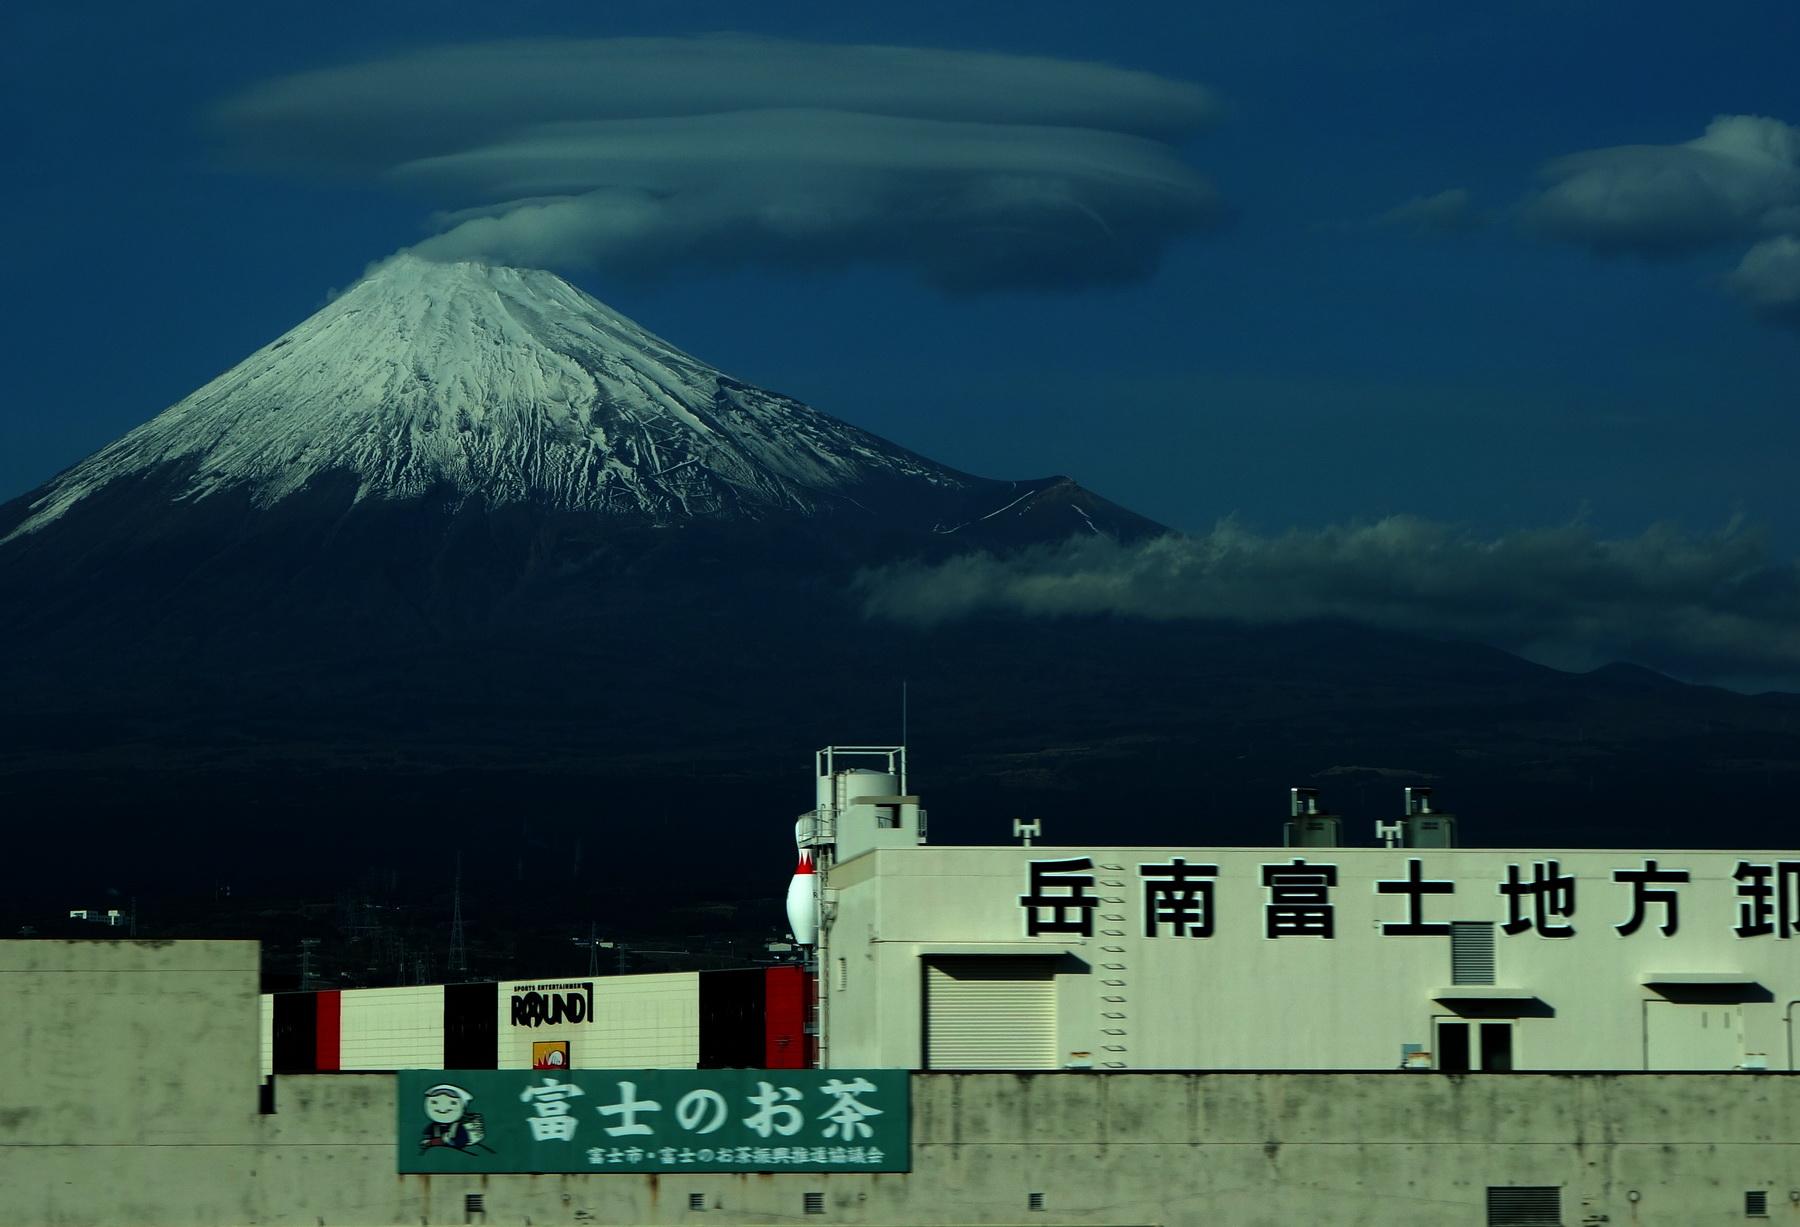 Лентикулярности вокруг Фуджи-сана